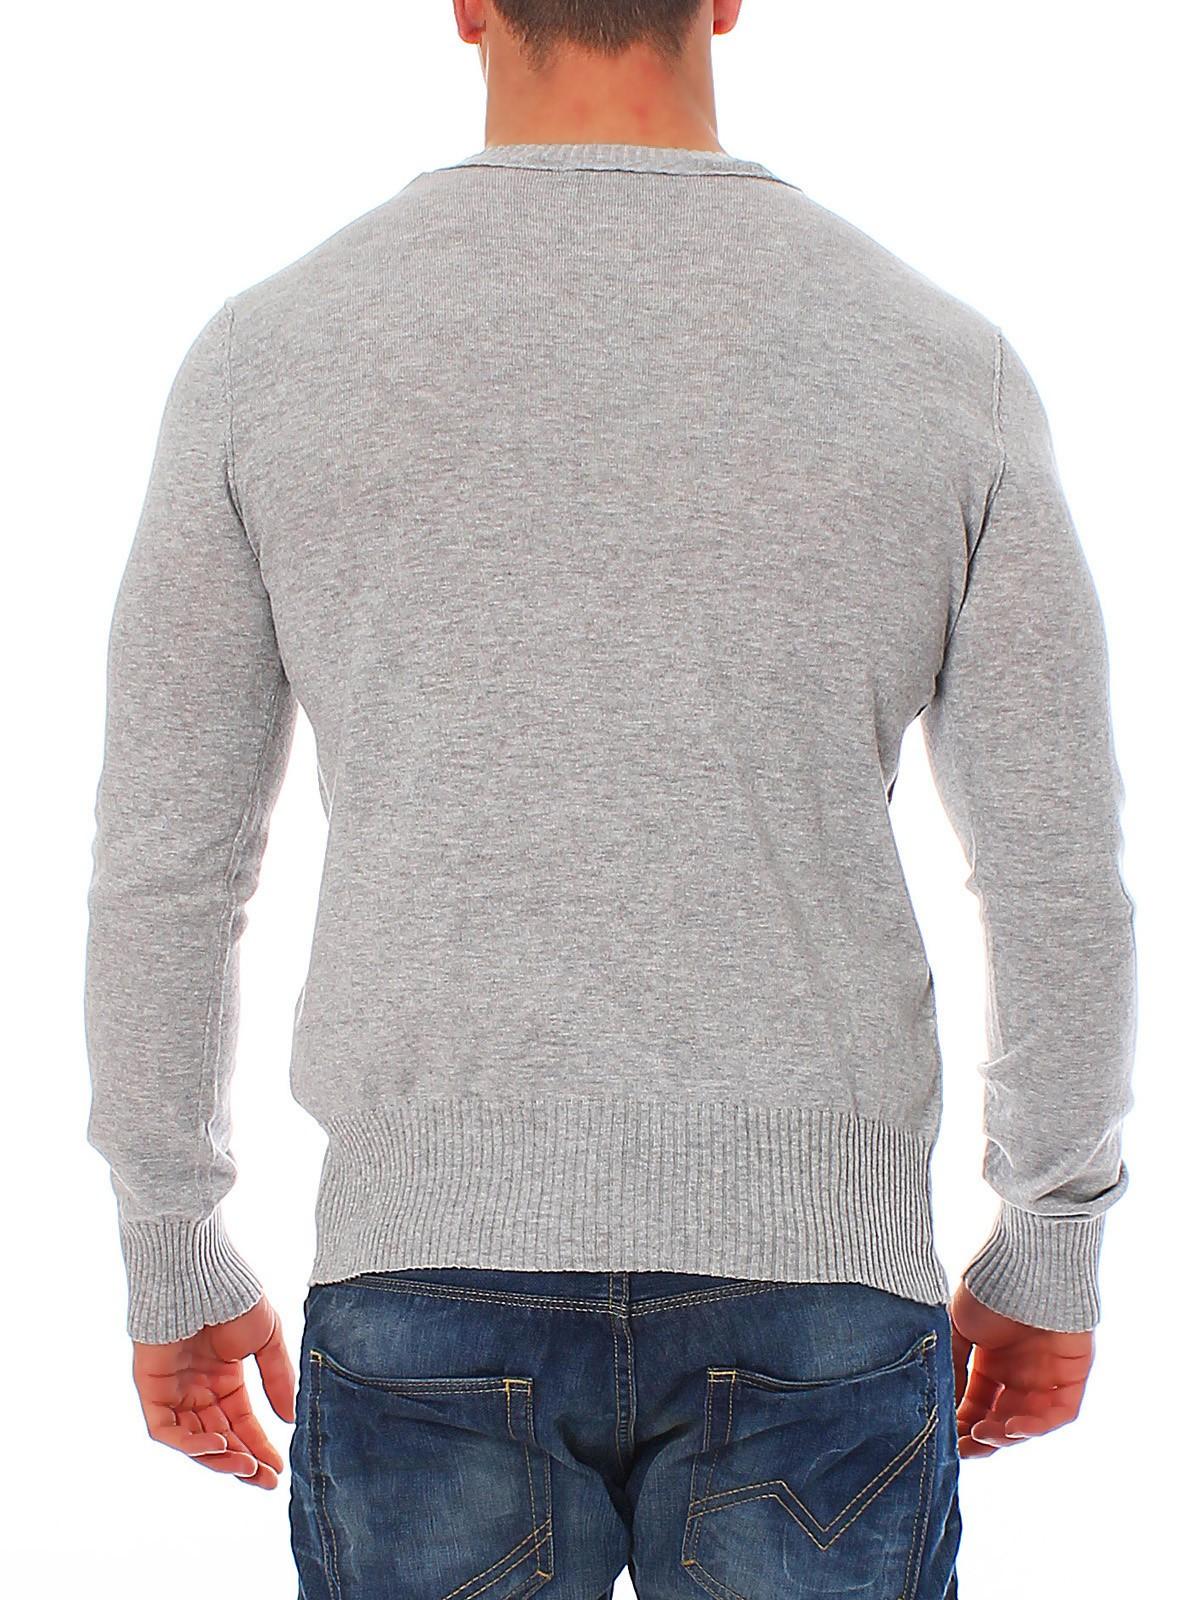 tom tailor herren pullover crew neck sweater 30111040912 grau ebay. Black Bedroom Furniture Sets. Home Design Ideas